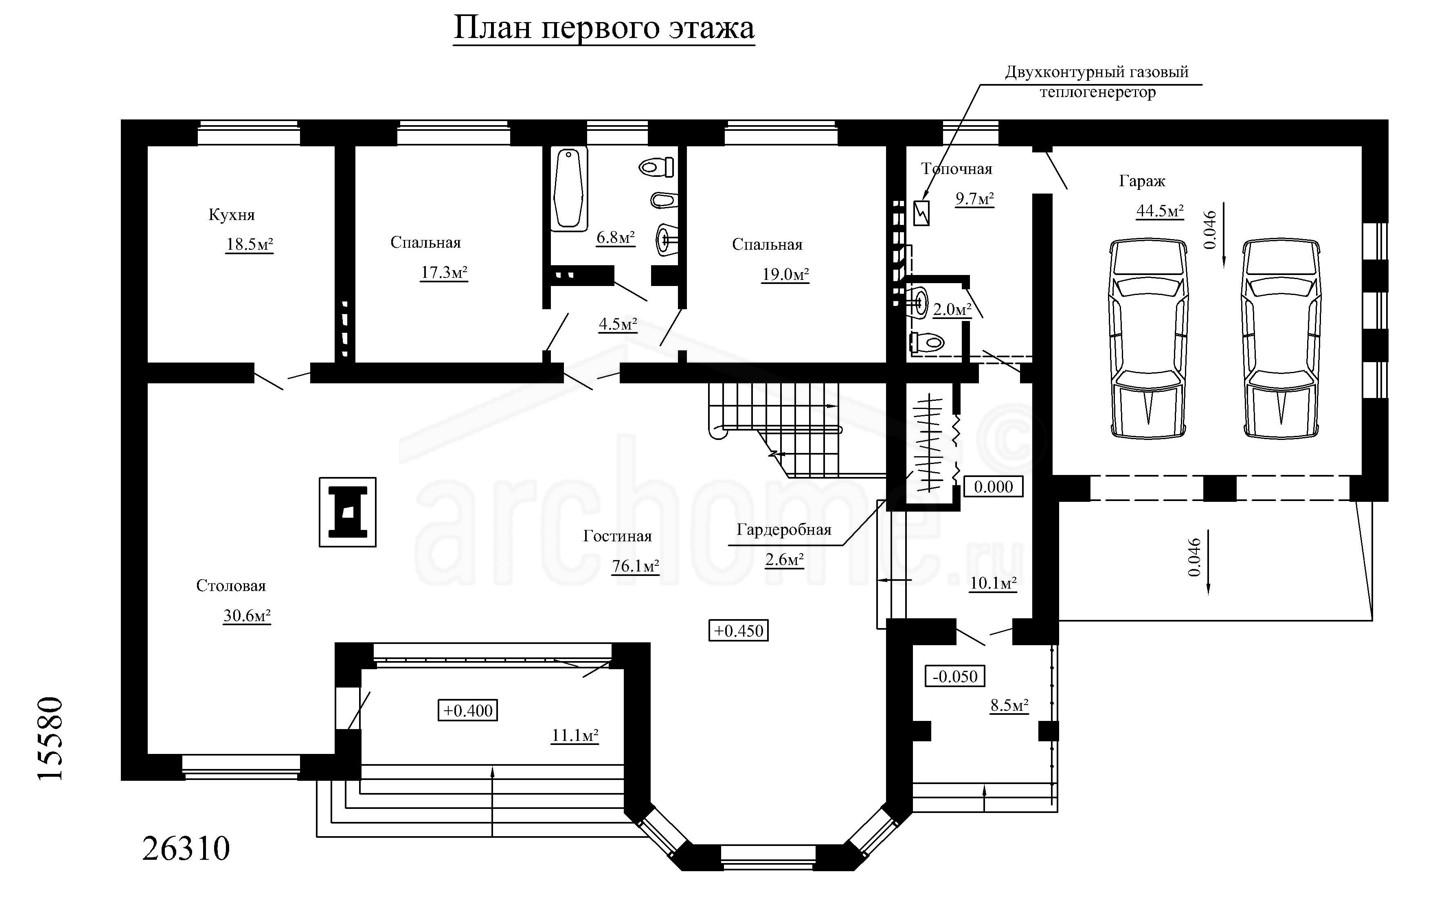 Планы этажей проекта ЛОТОС 1